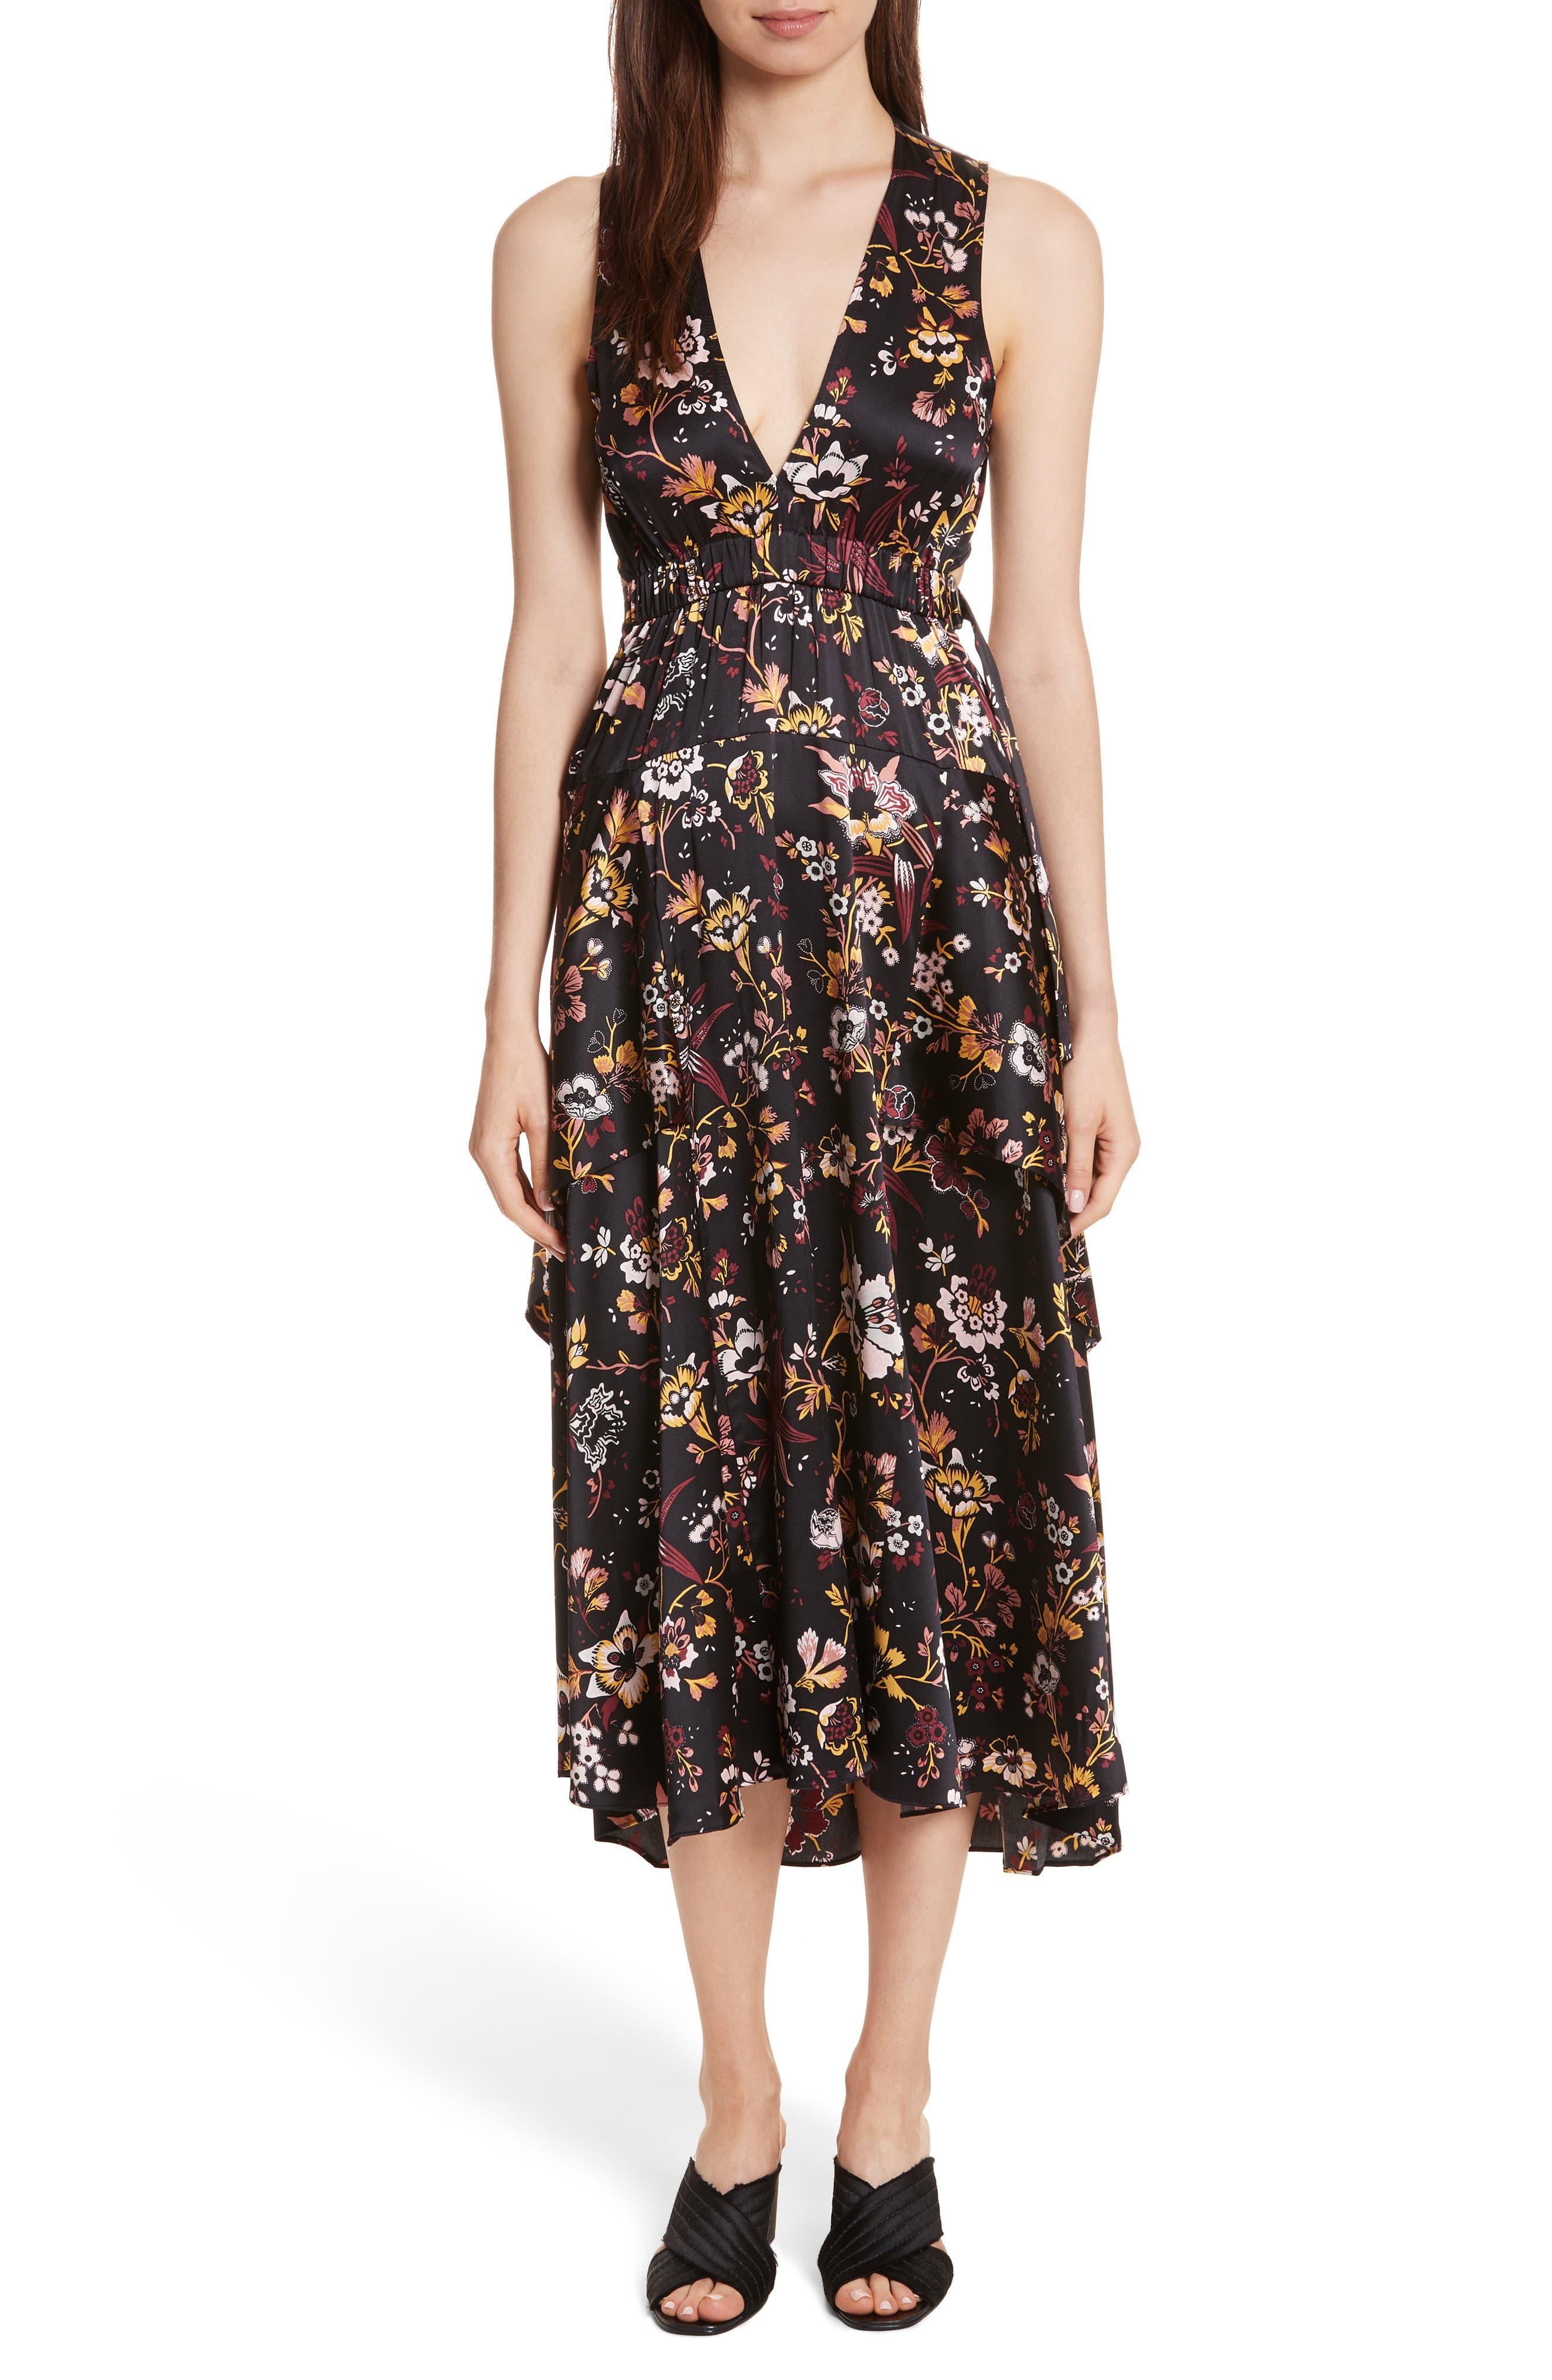 Main Image - A.L.C. Verbena Floral Print Stretch Silk Dress